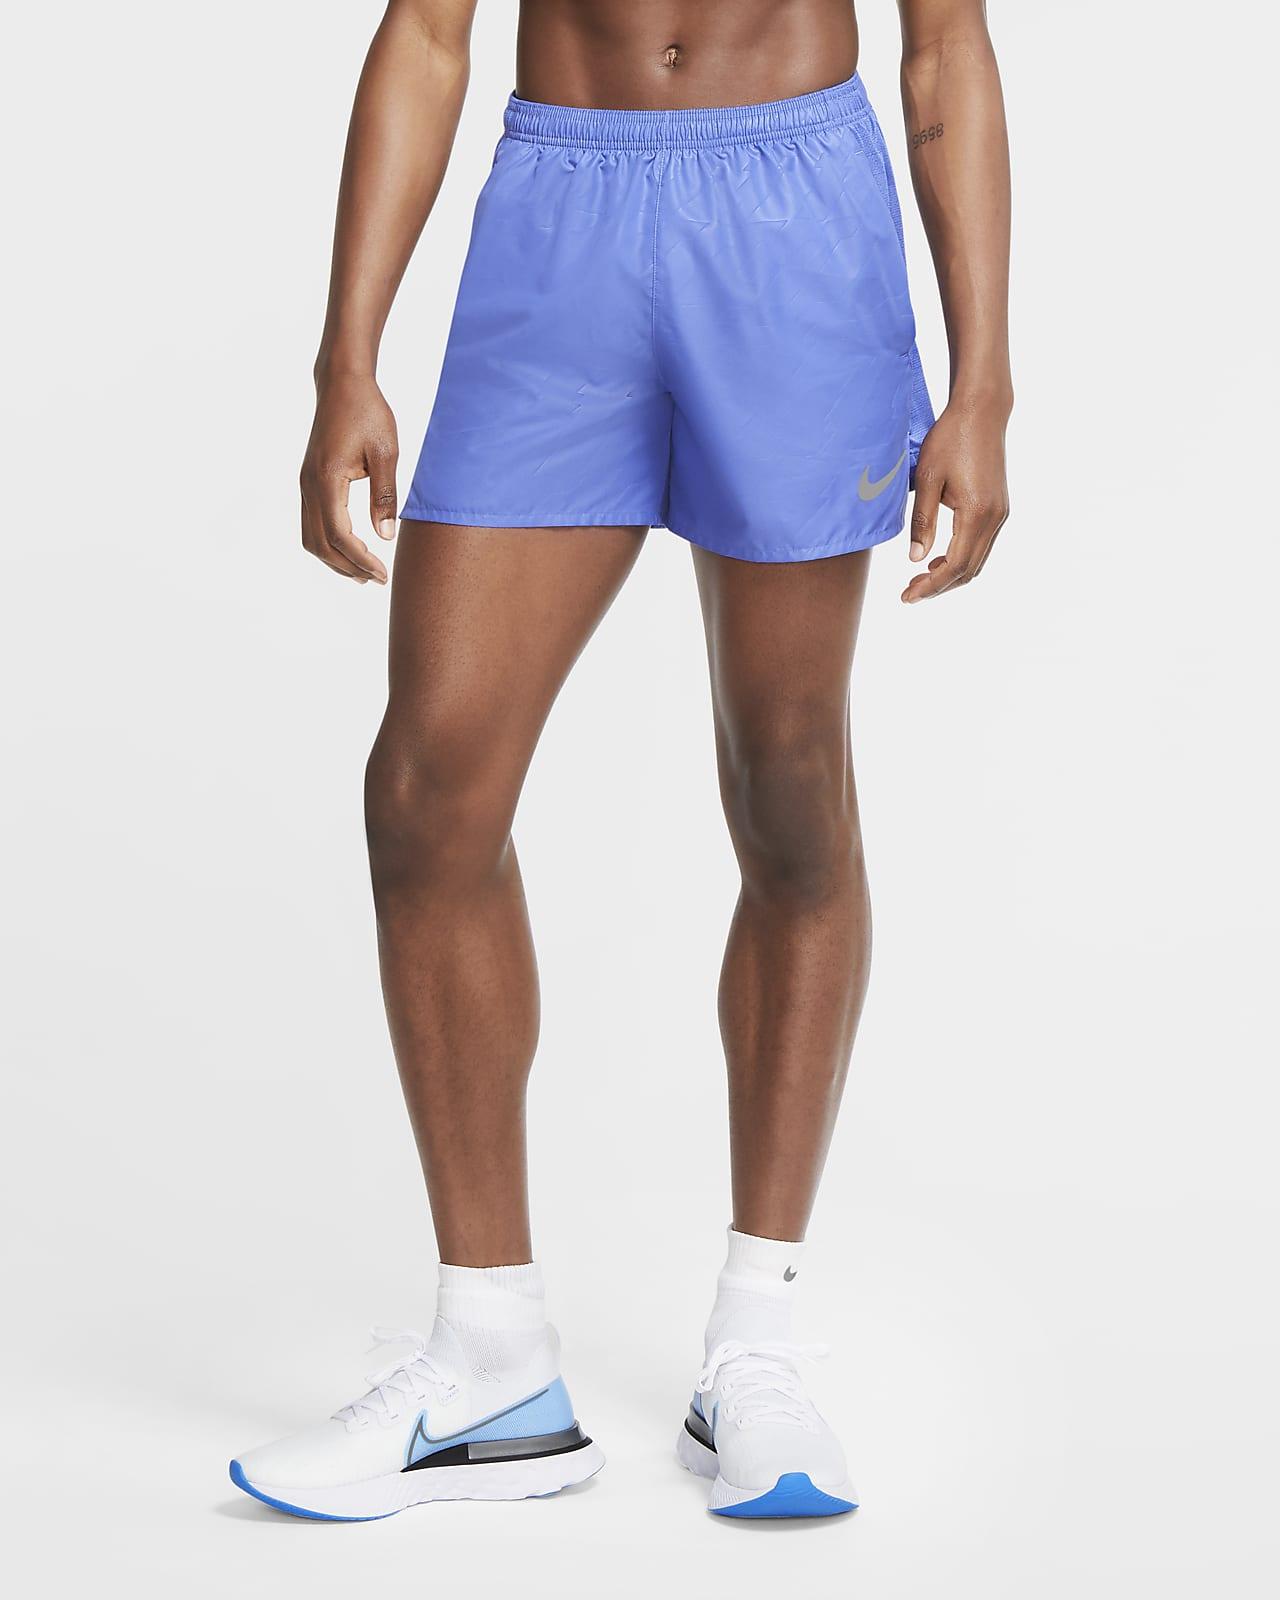 Larry Belmont detección Tectónico  Shorts de running estampados para hombre Nike Challenger Future Fast. Nike .com